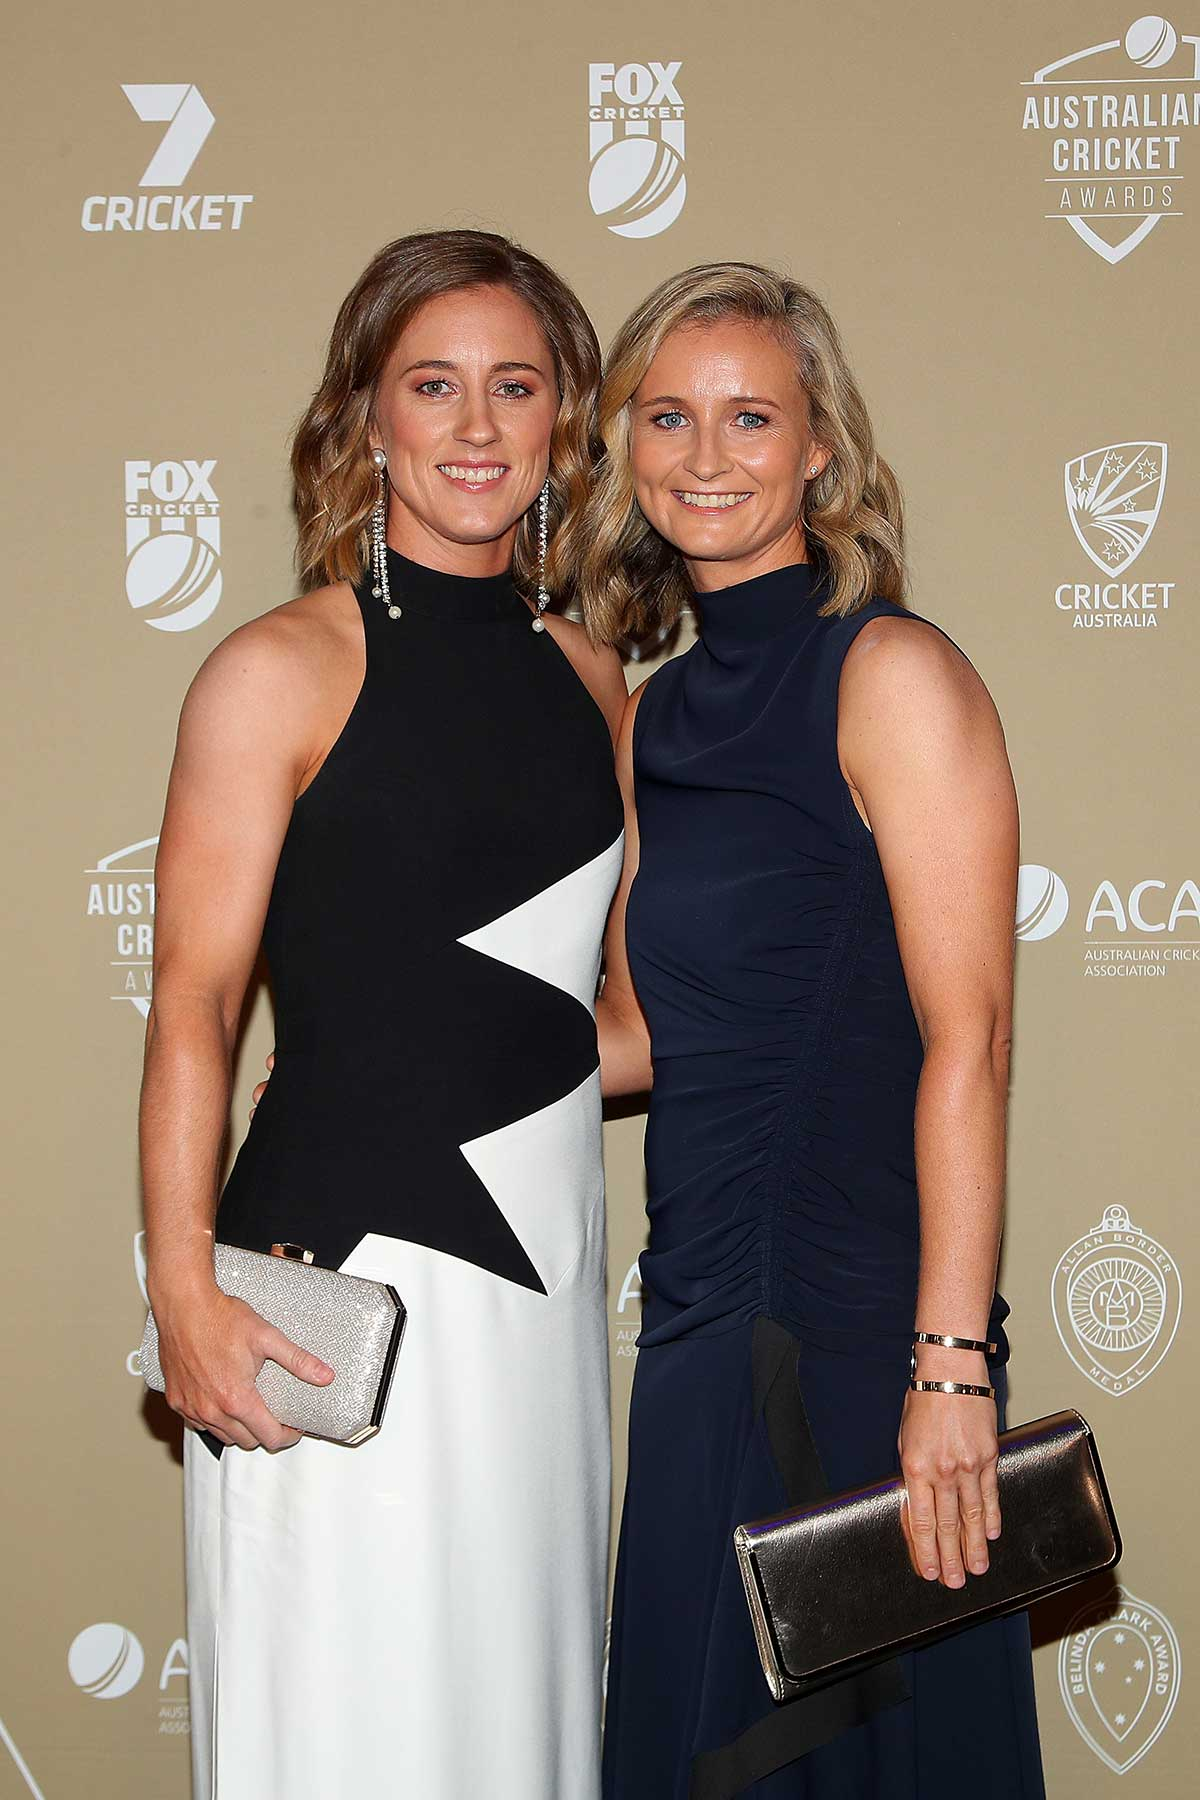 Rachel Haynes and Leah Poulton // Getty